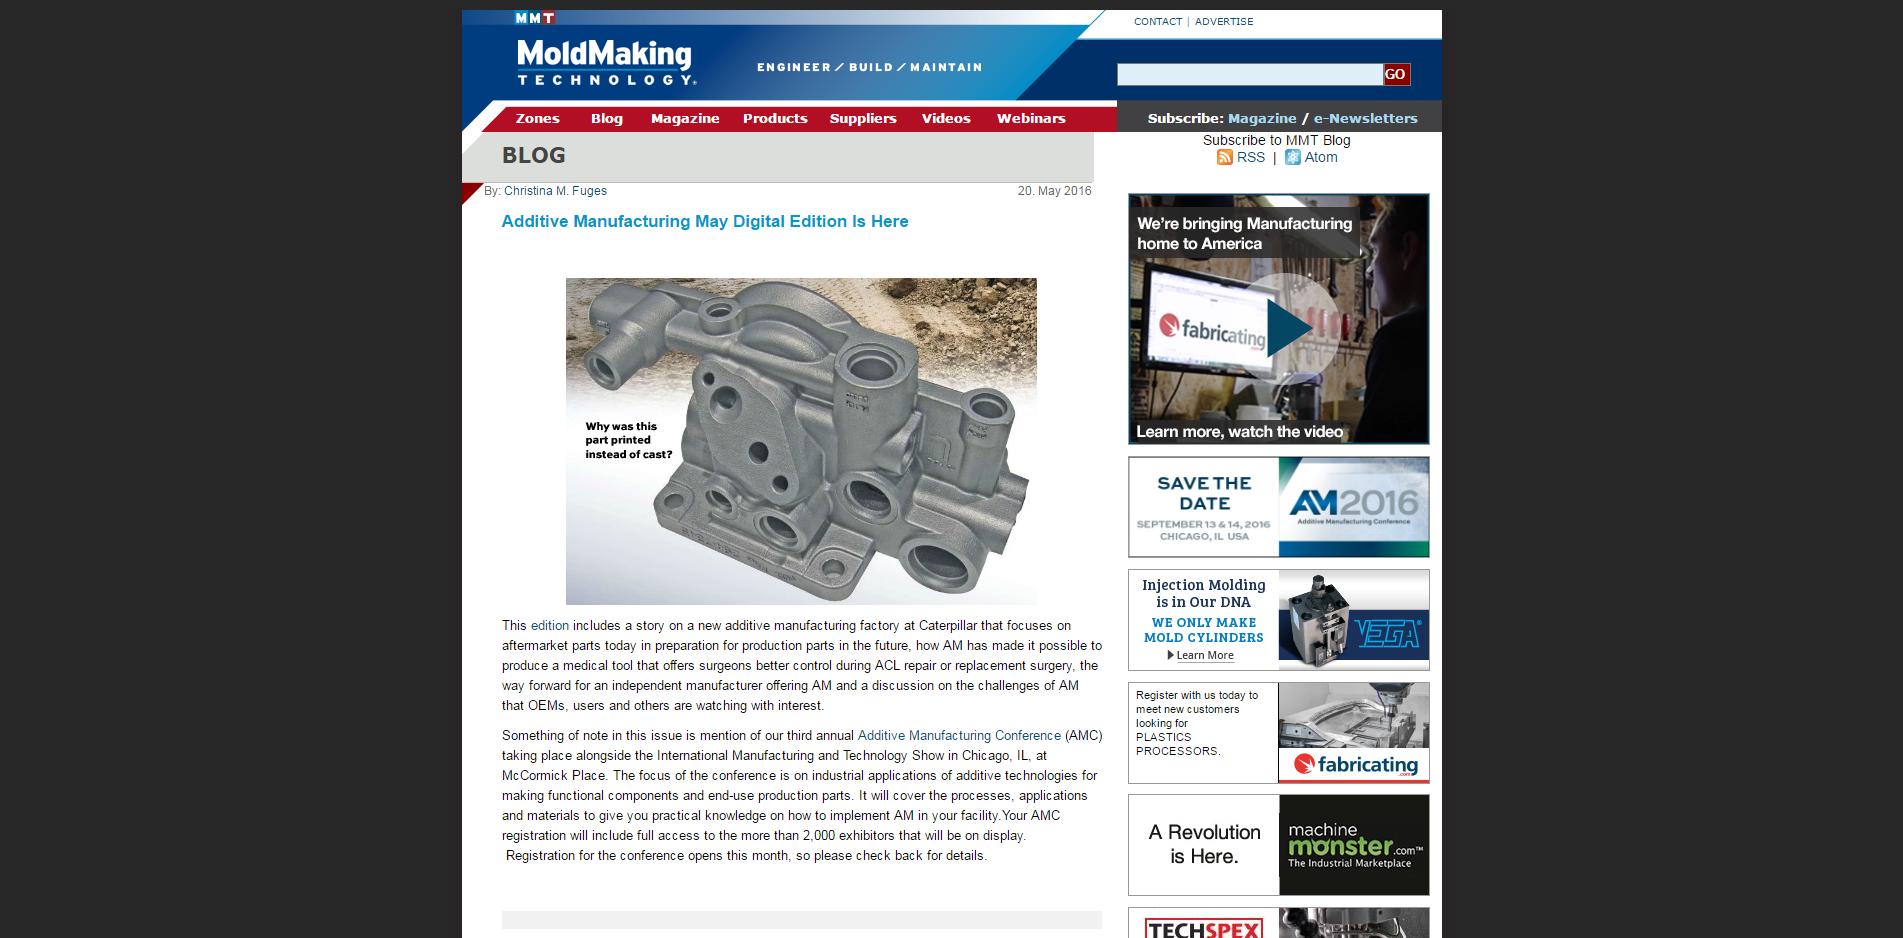 Blog___MoldMaking_Technology.png